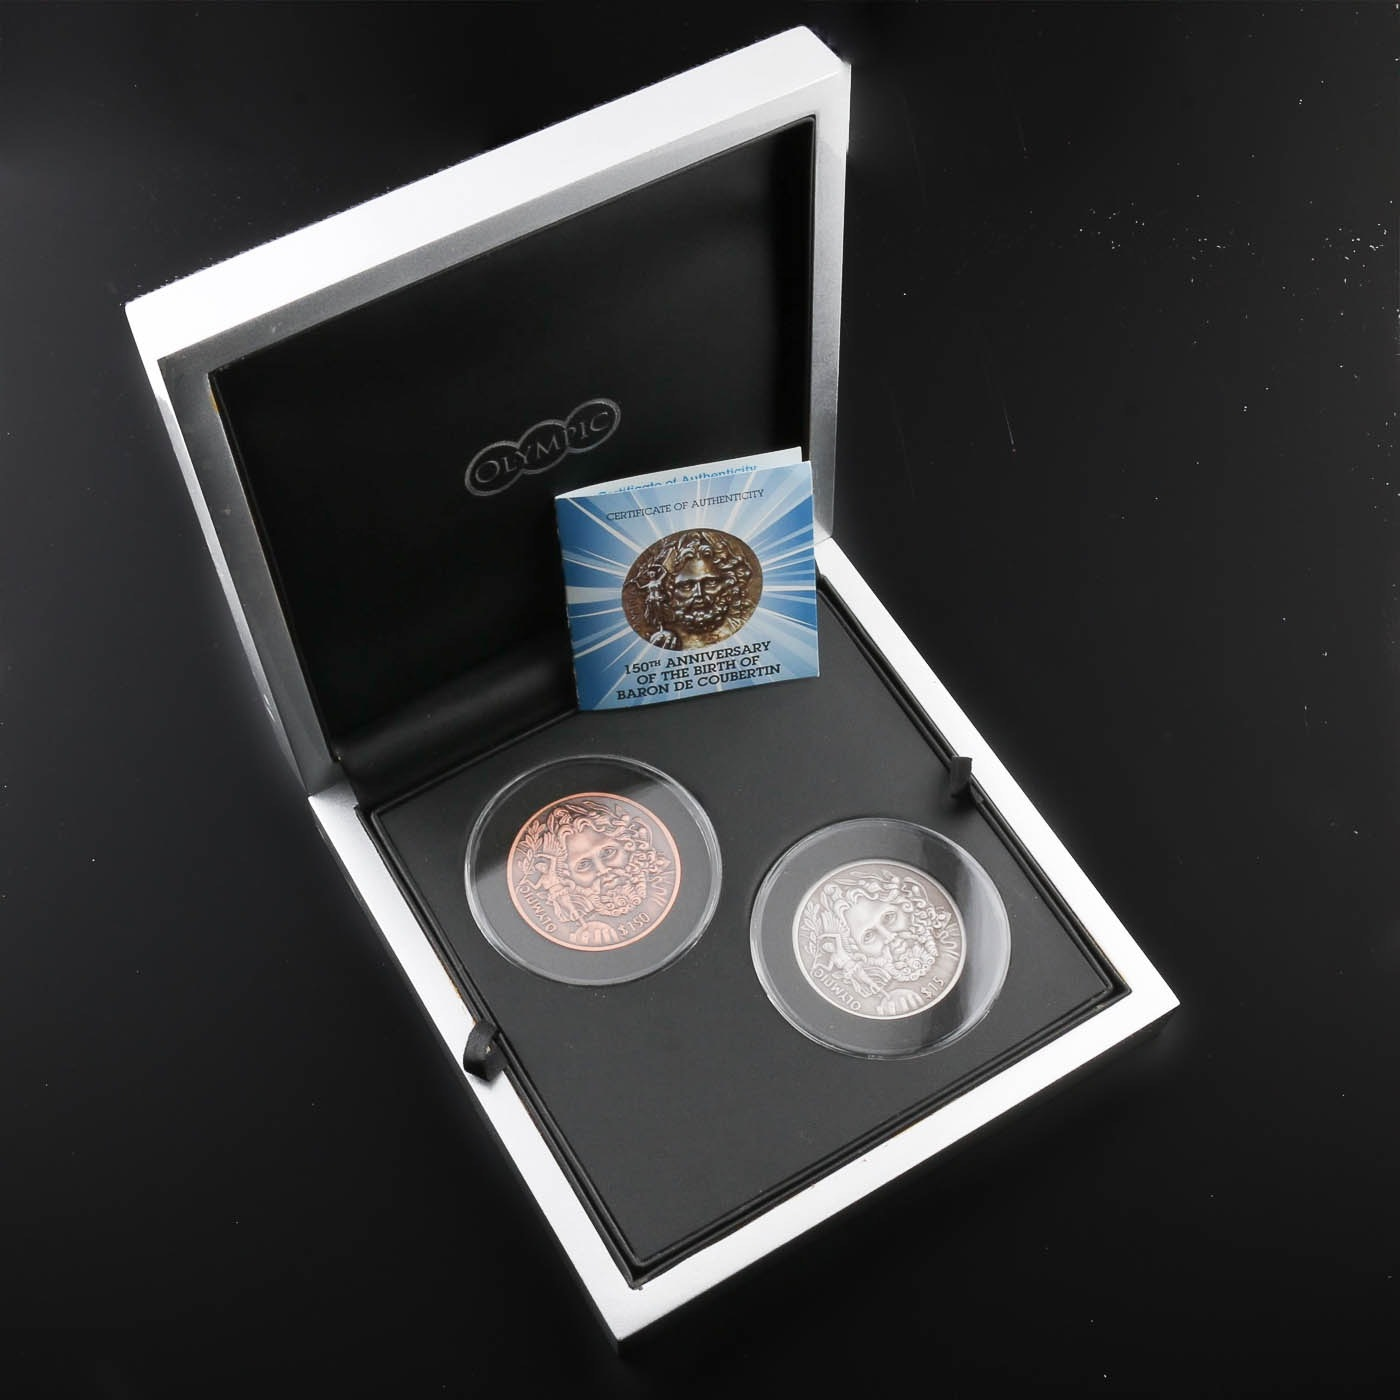 2013 British Virgin Islands Baron De Coubertin Commemorative Coin Set